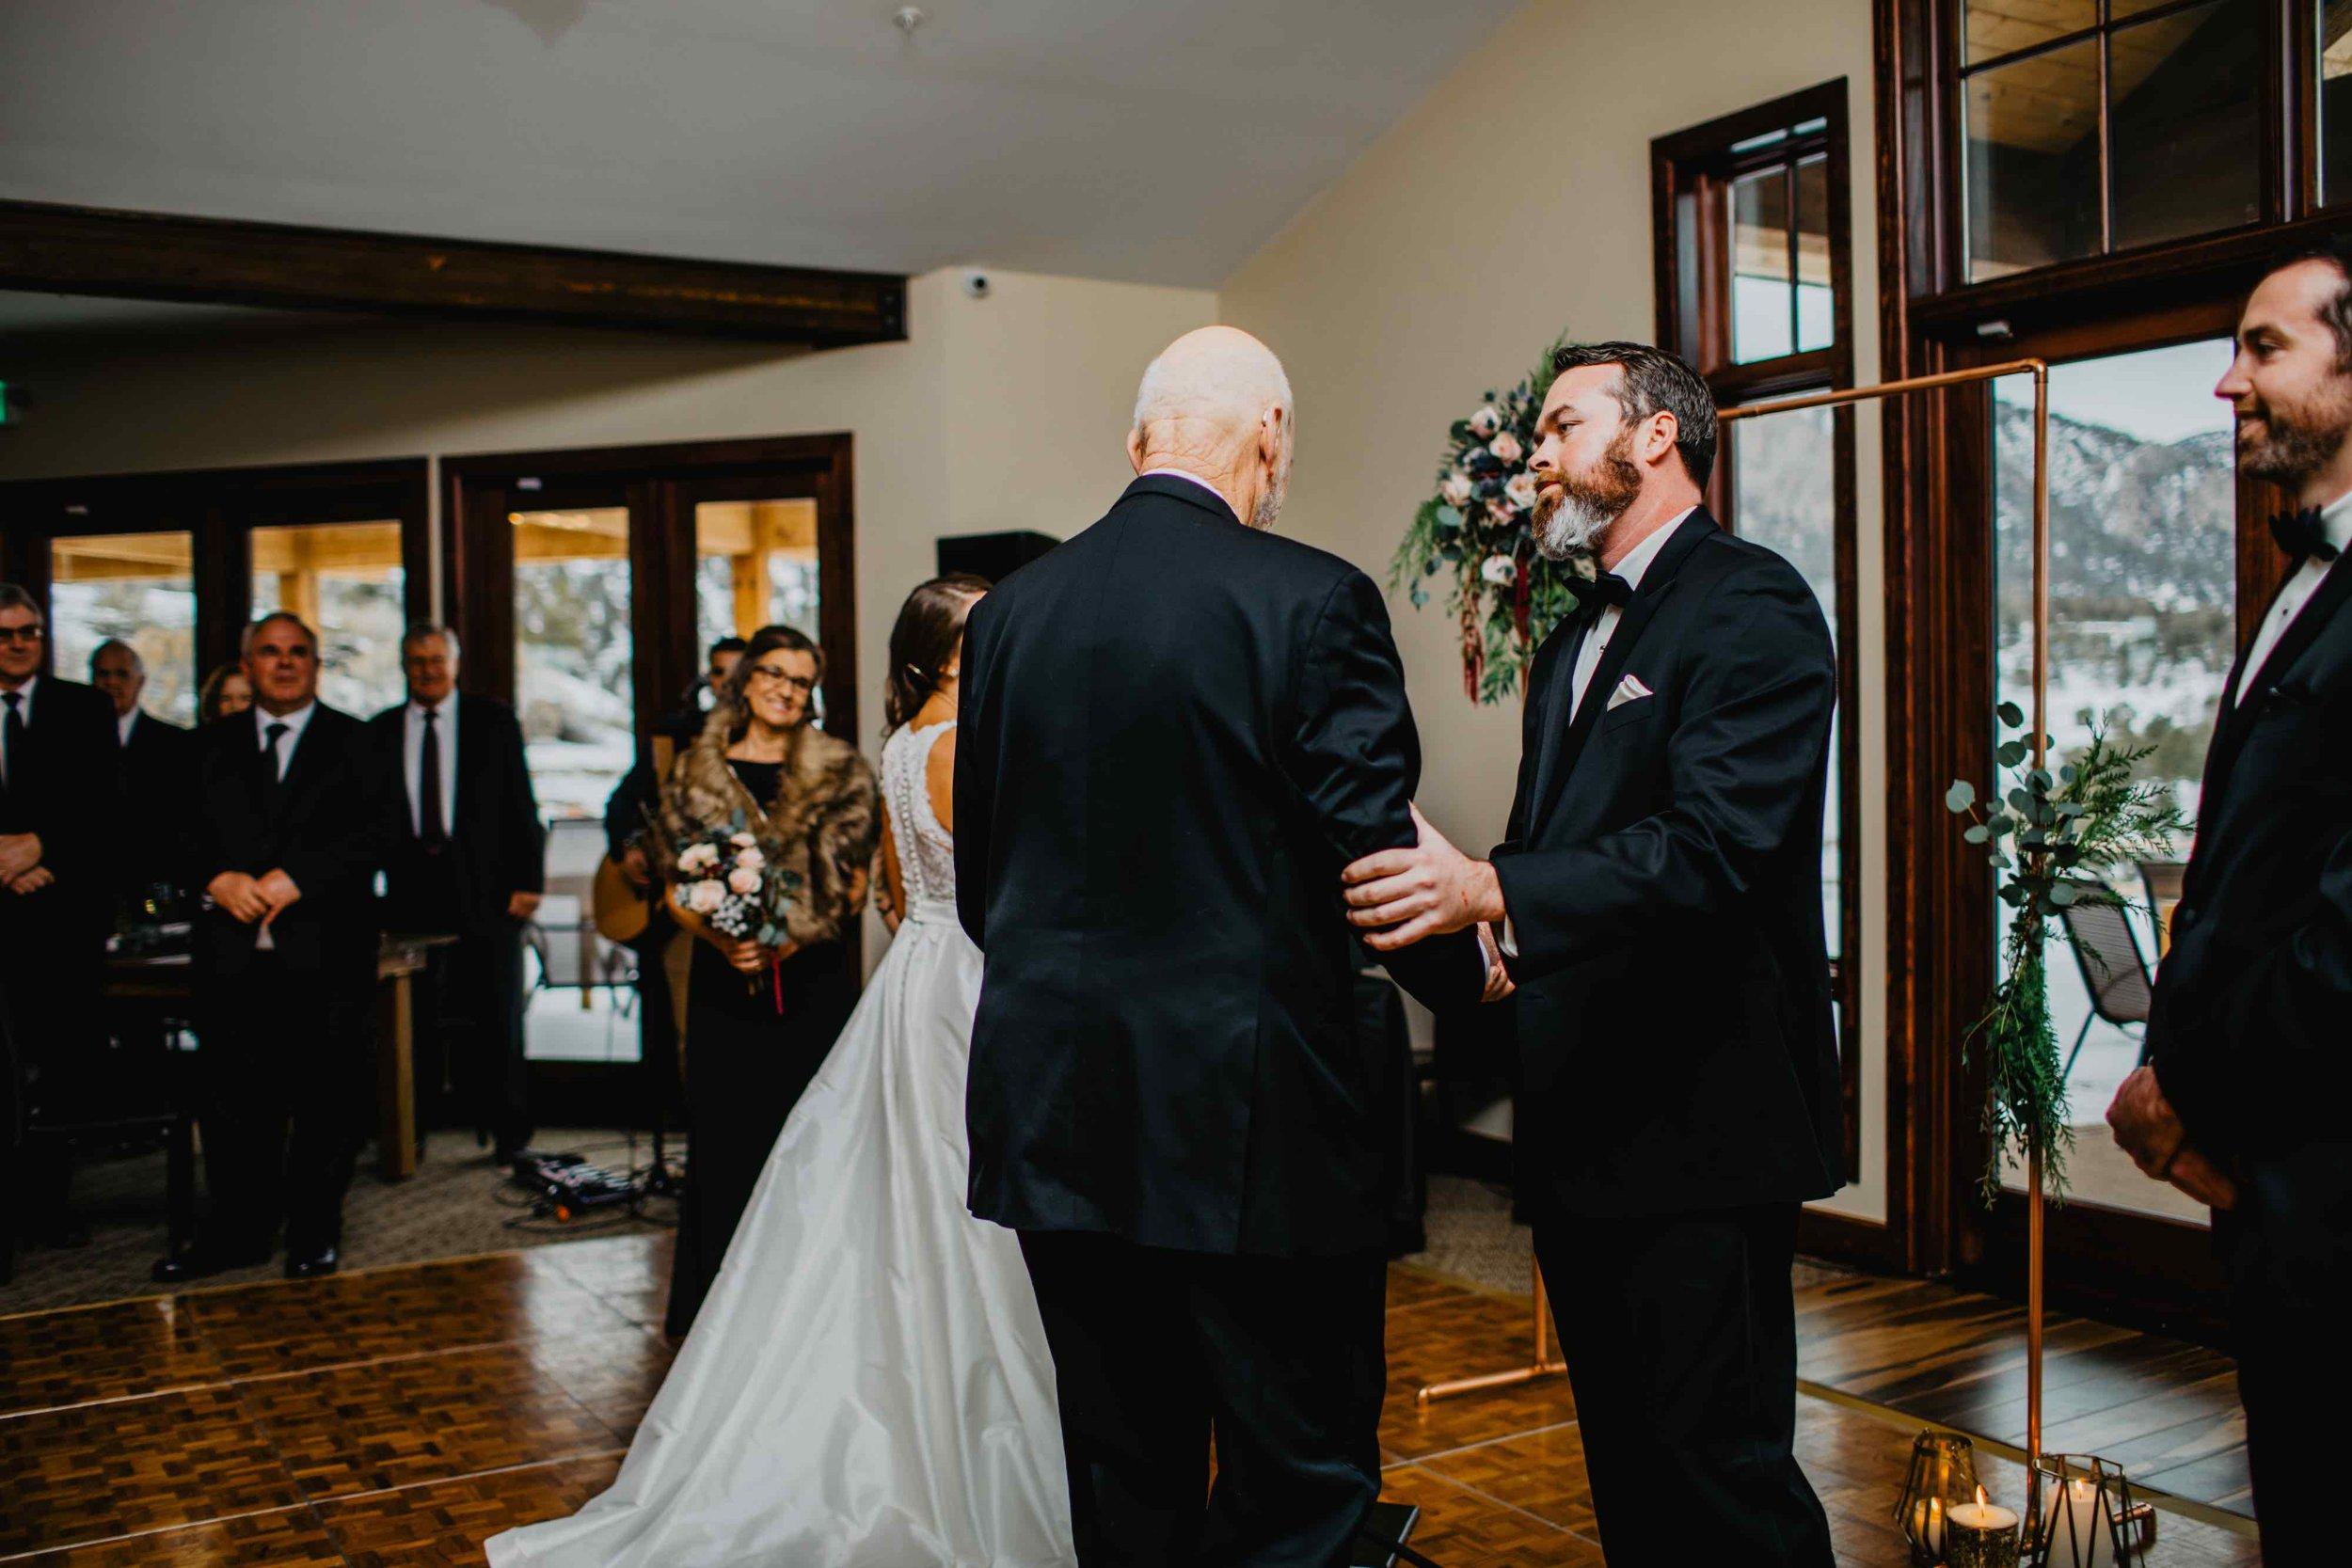 Kisa Conrad Favorites-0003-colorado-wedding-photographer-denver-springs-vailhotel-glenwood-springs-colorado-wedding-photographer.jpeg